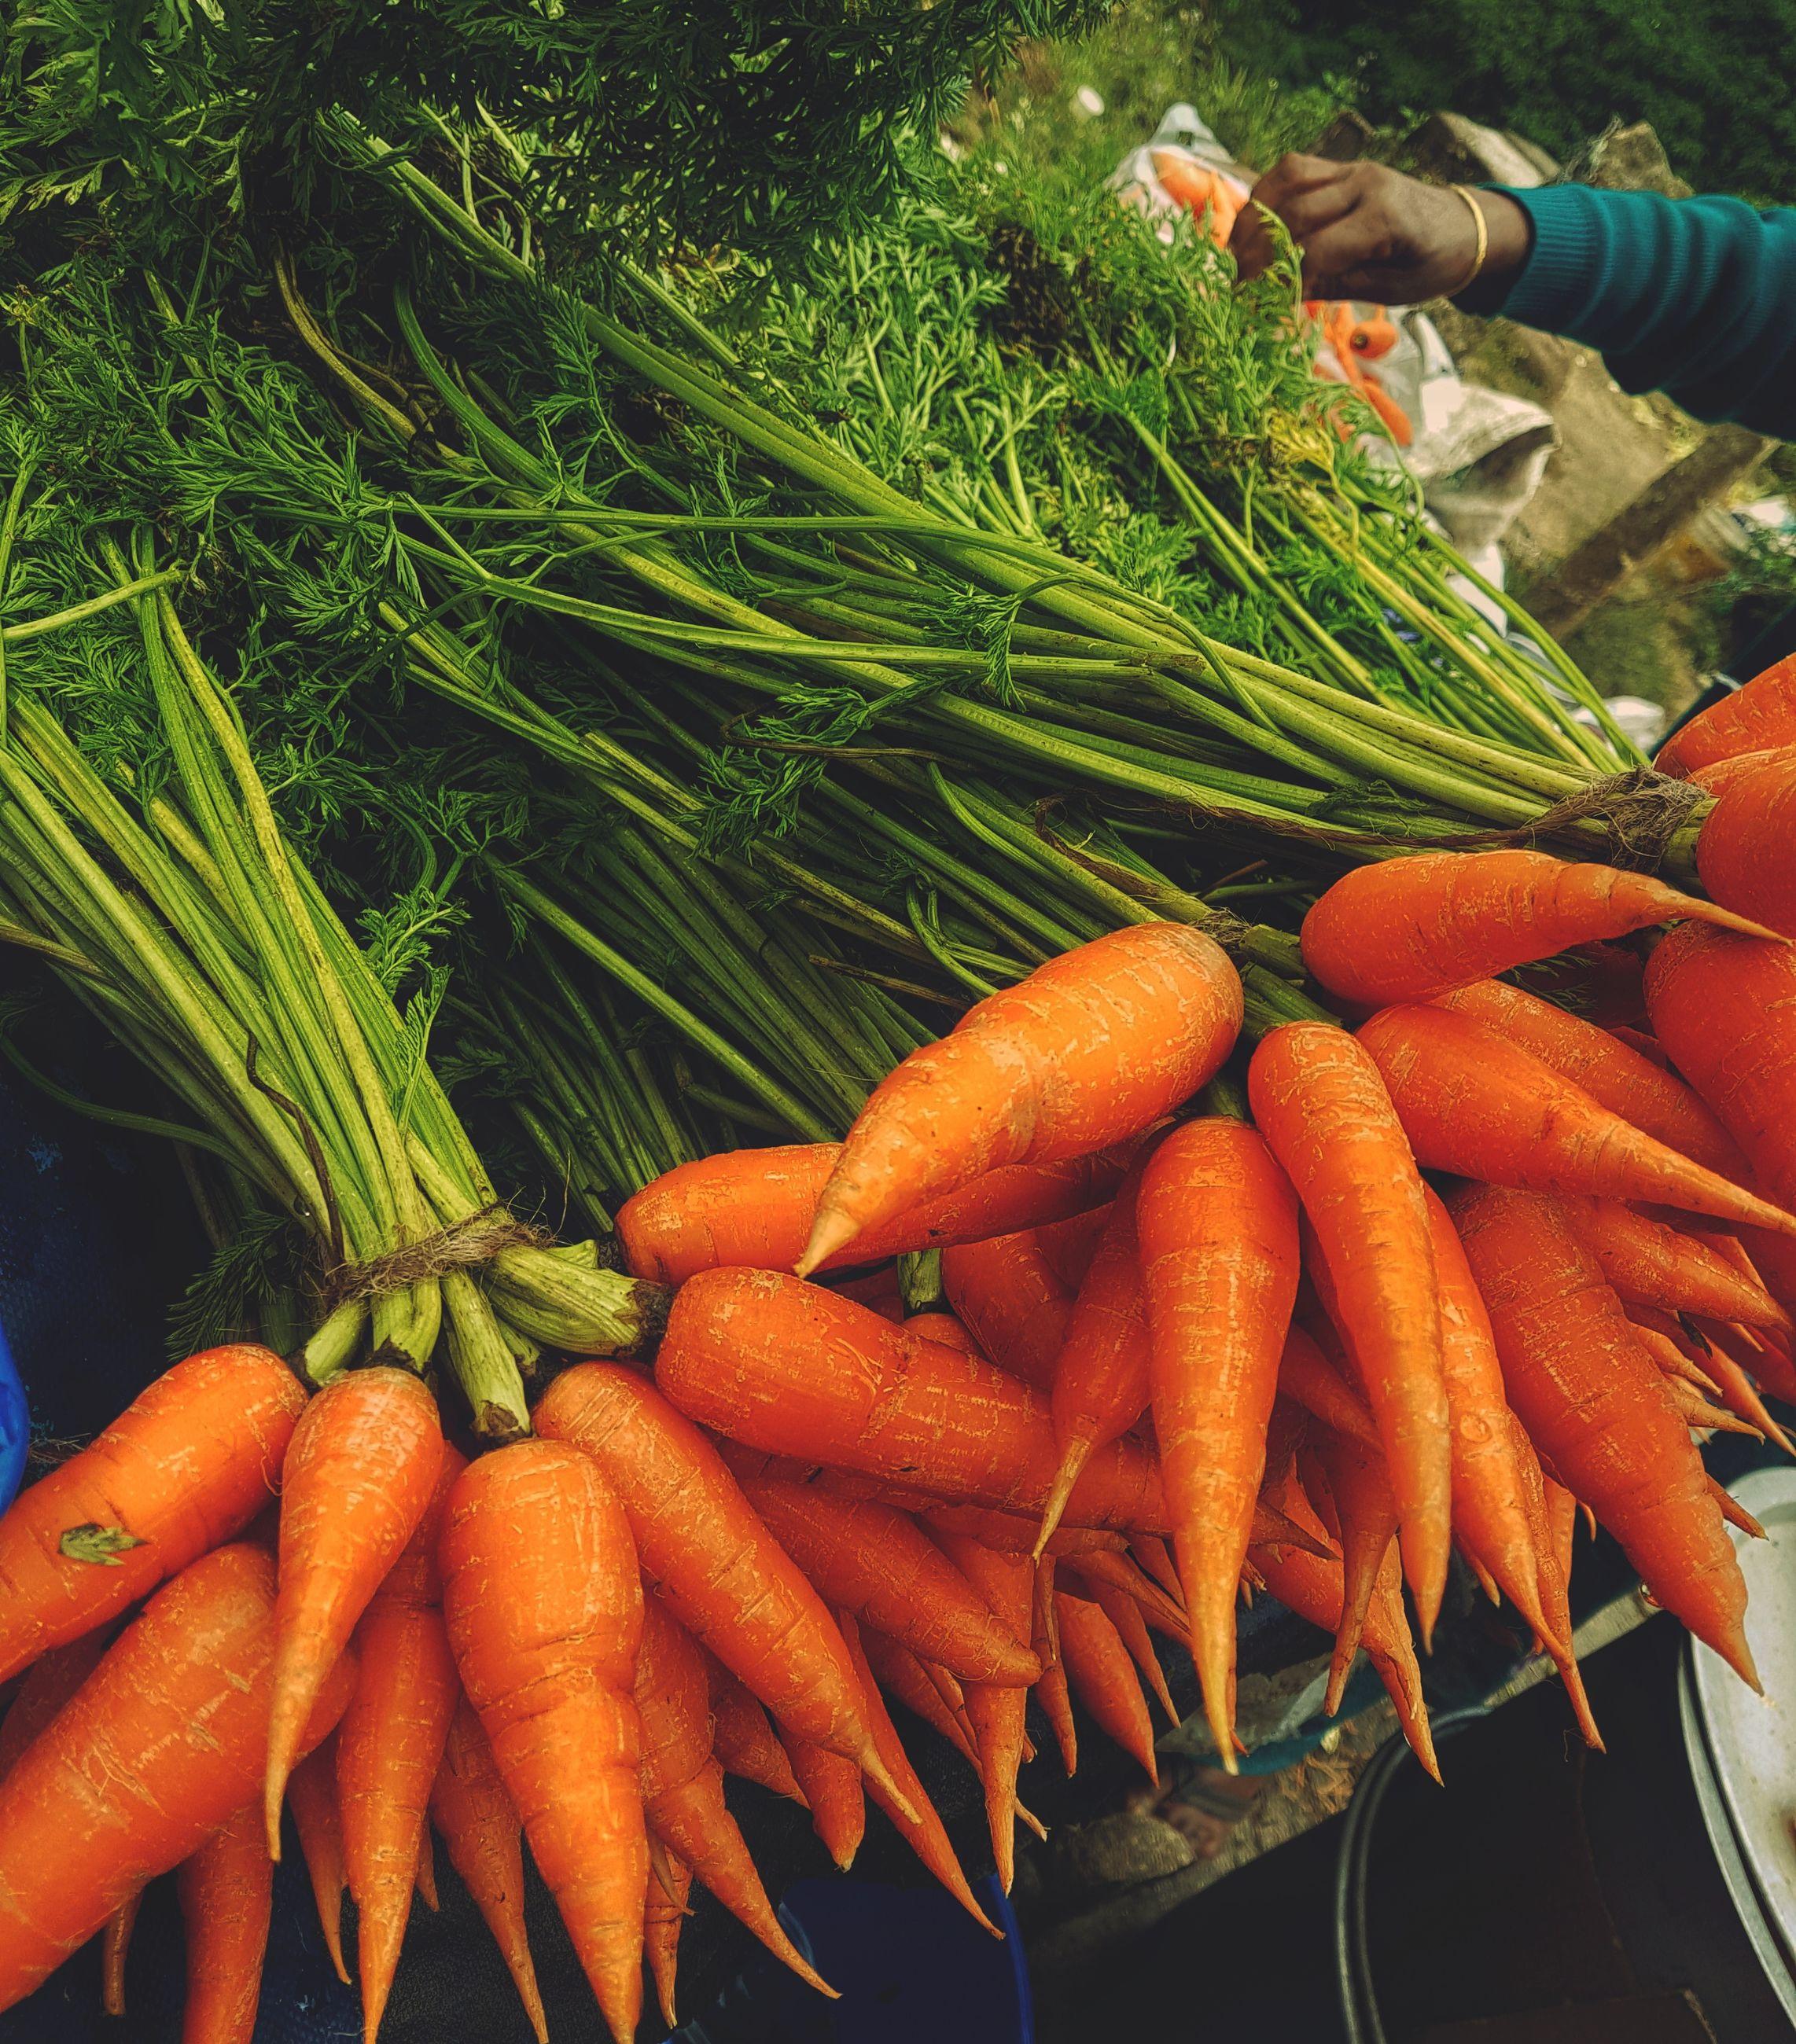 Close-up of carrots at market stall